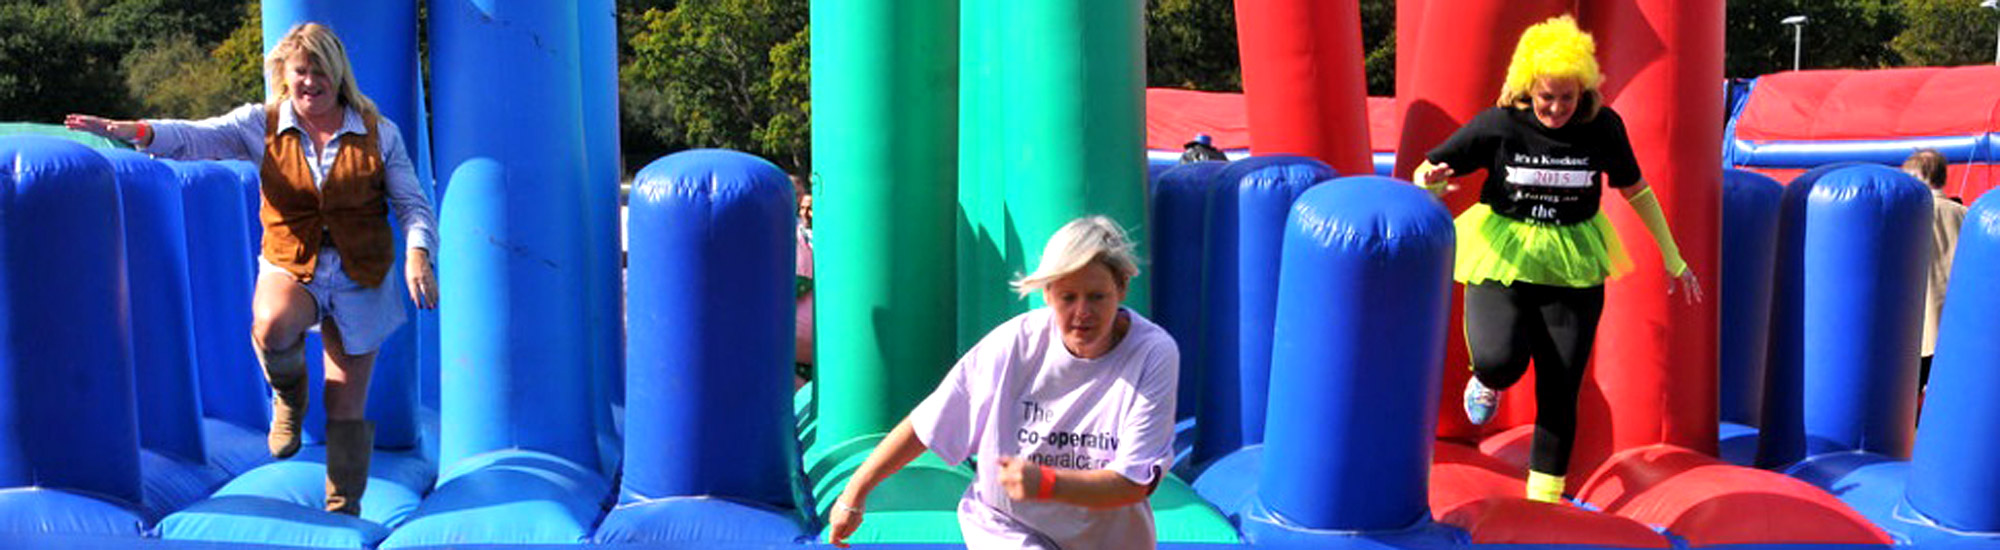 Running across our Bondi Bash inflatable